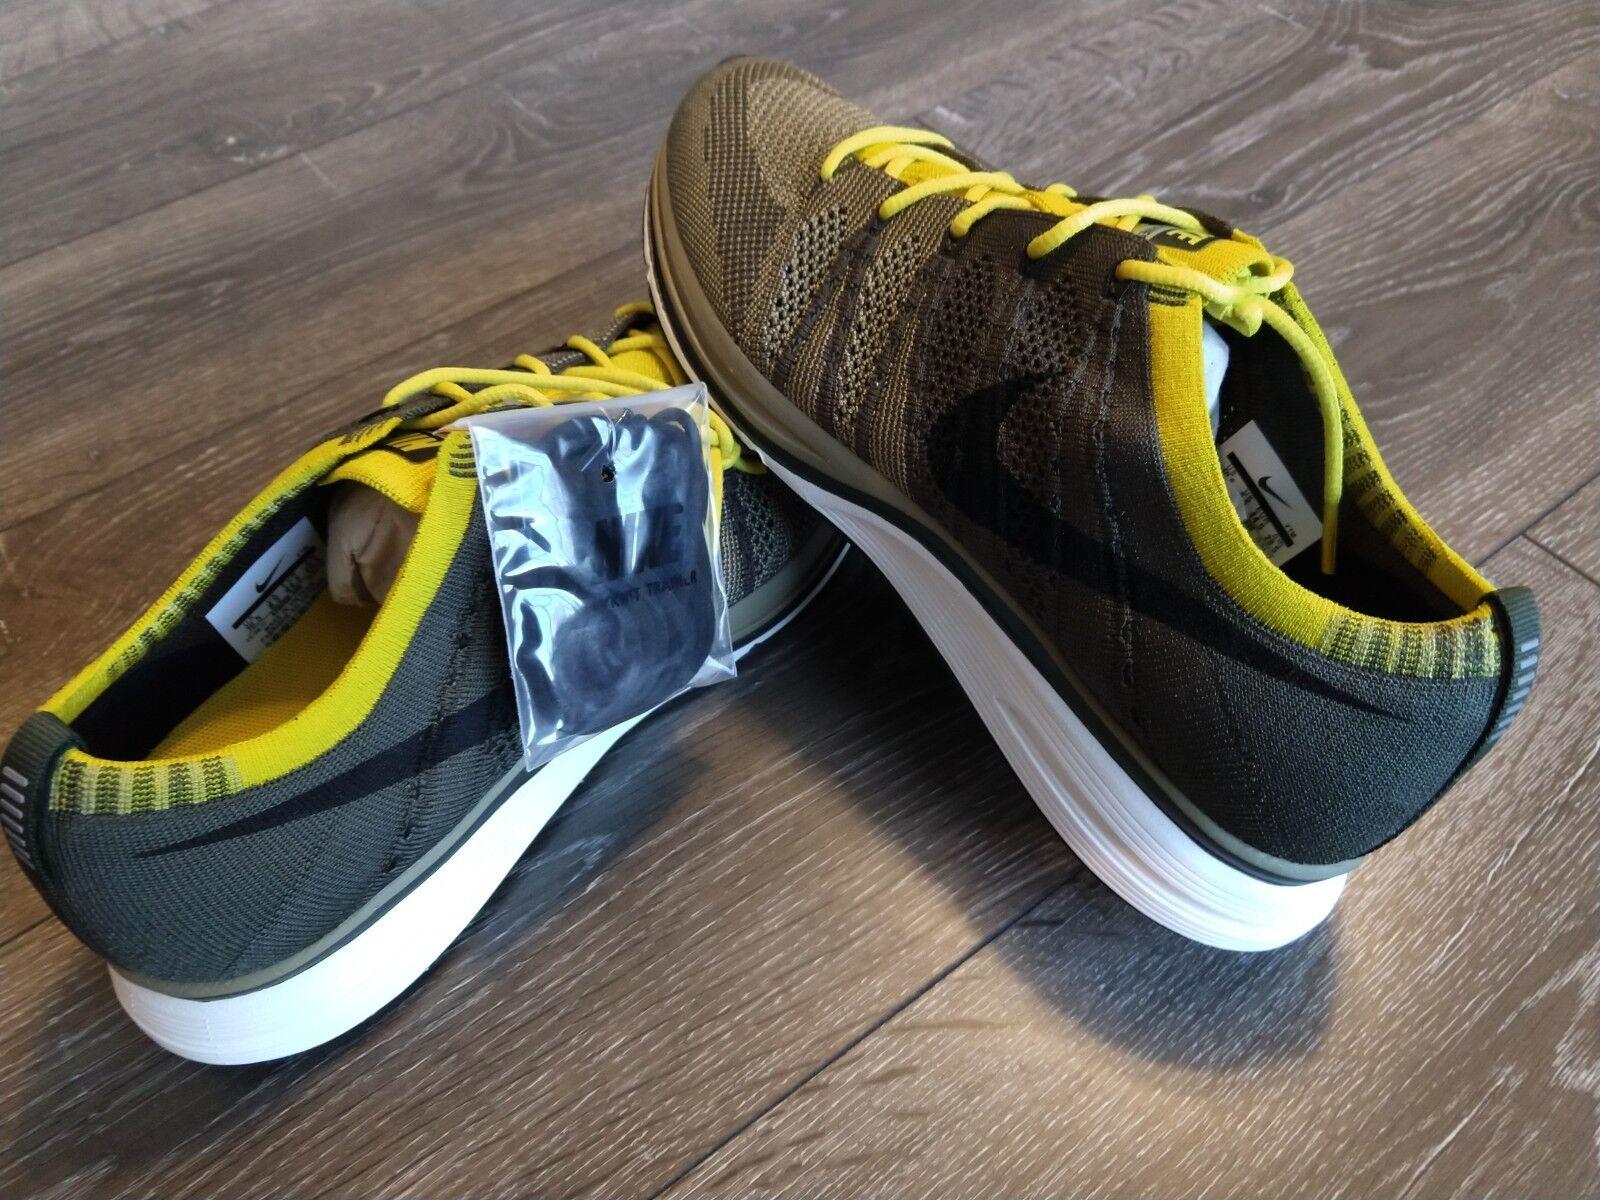 Nike Flyknit Mens Green Yellow SZ 10.5 Running Training shoes AH8396-007 NIB